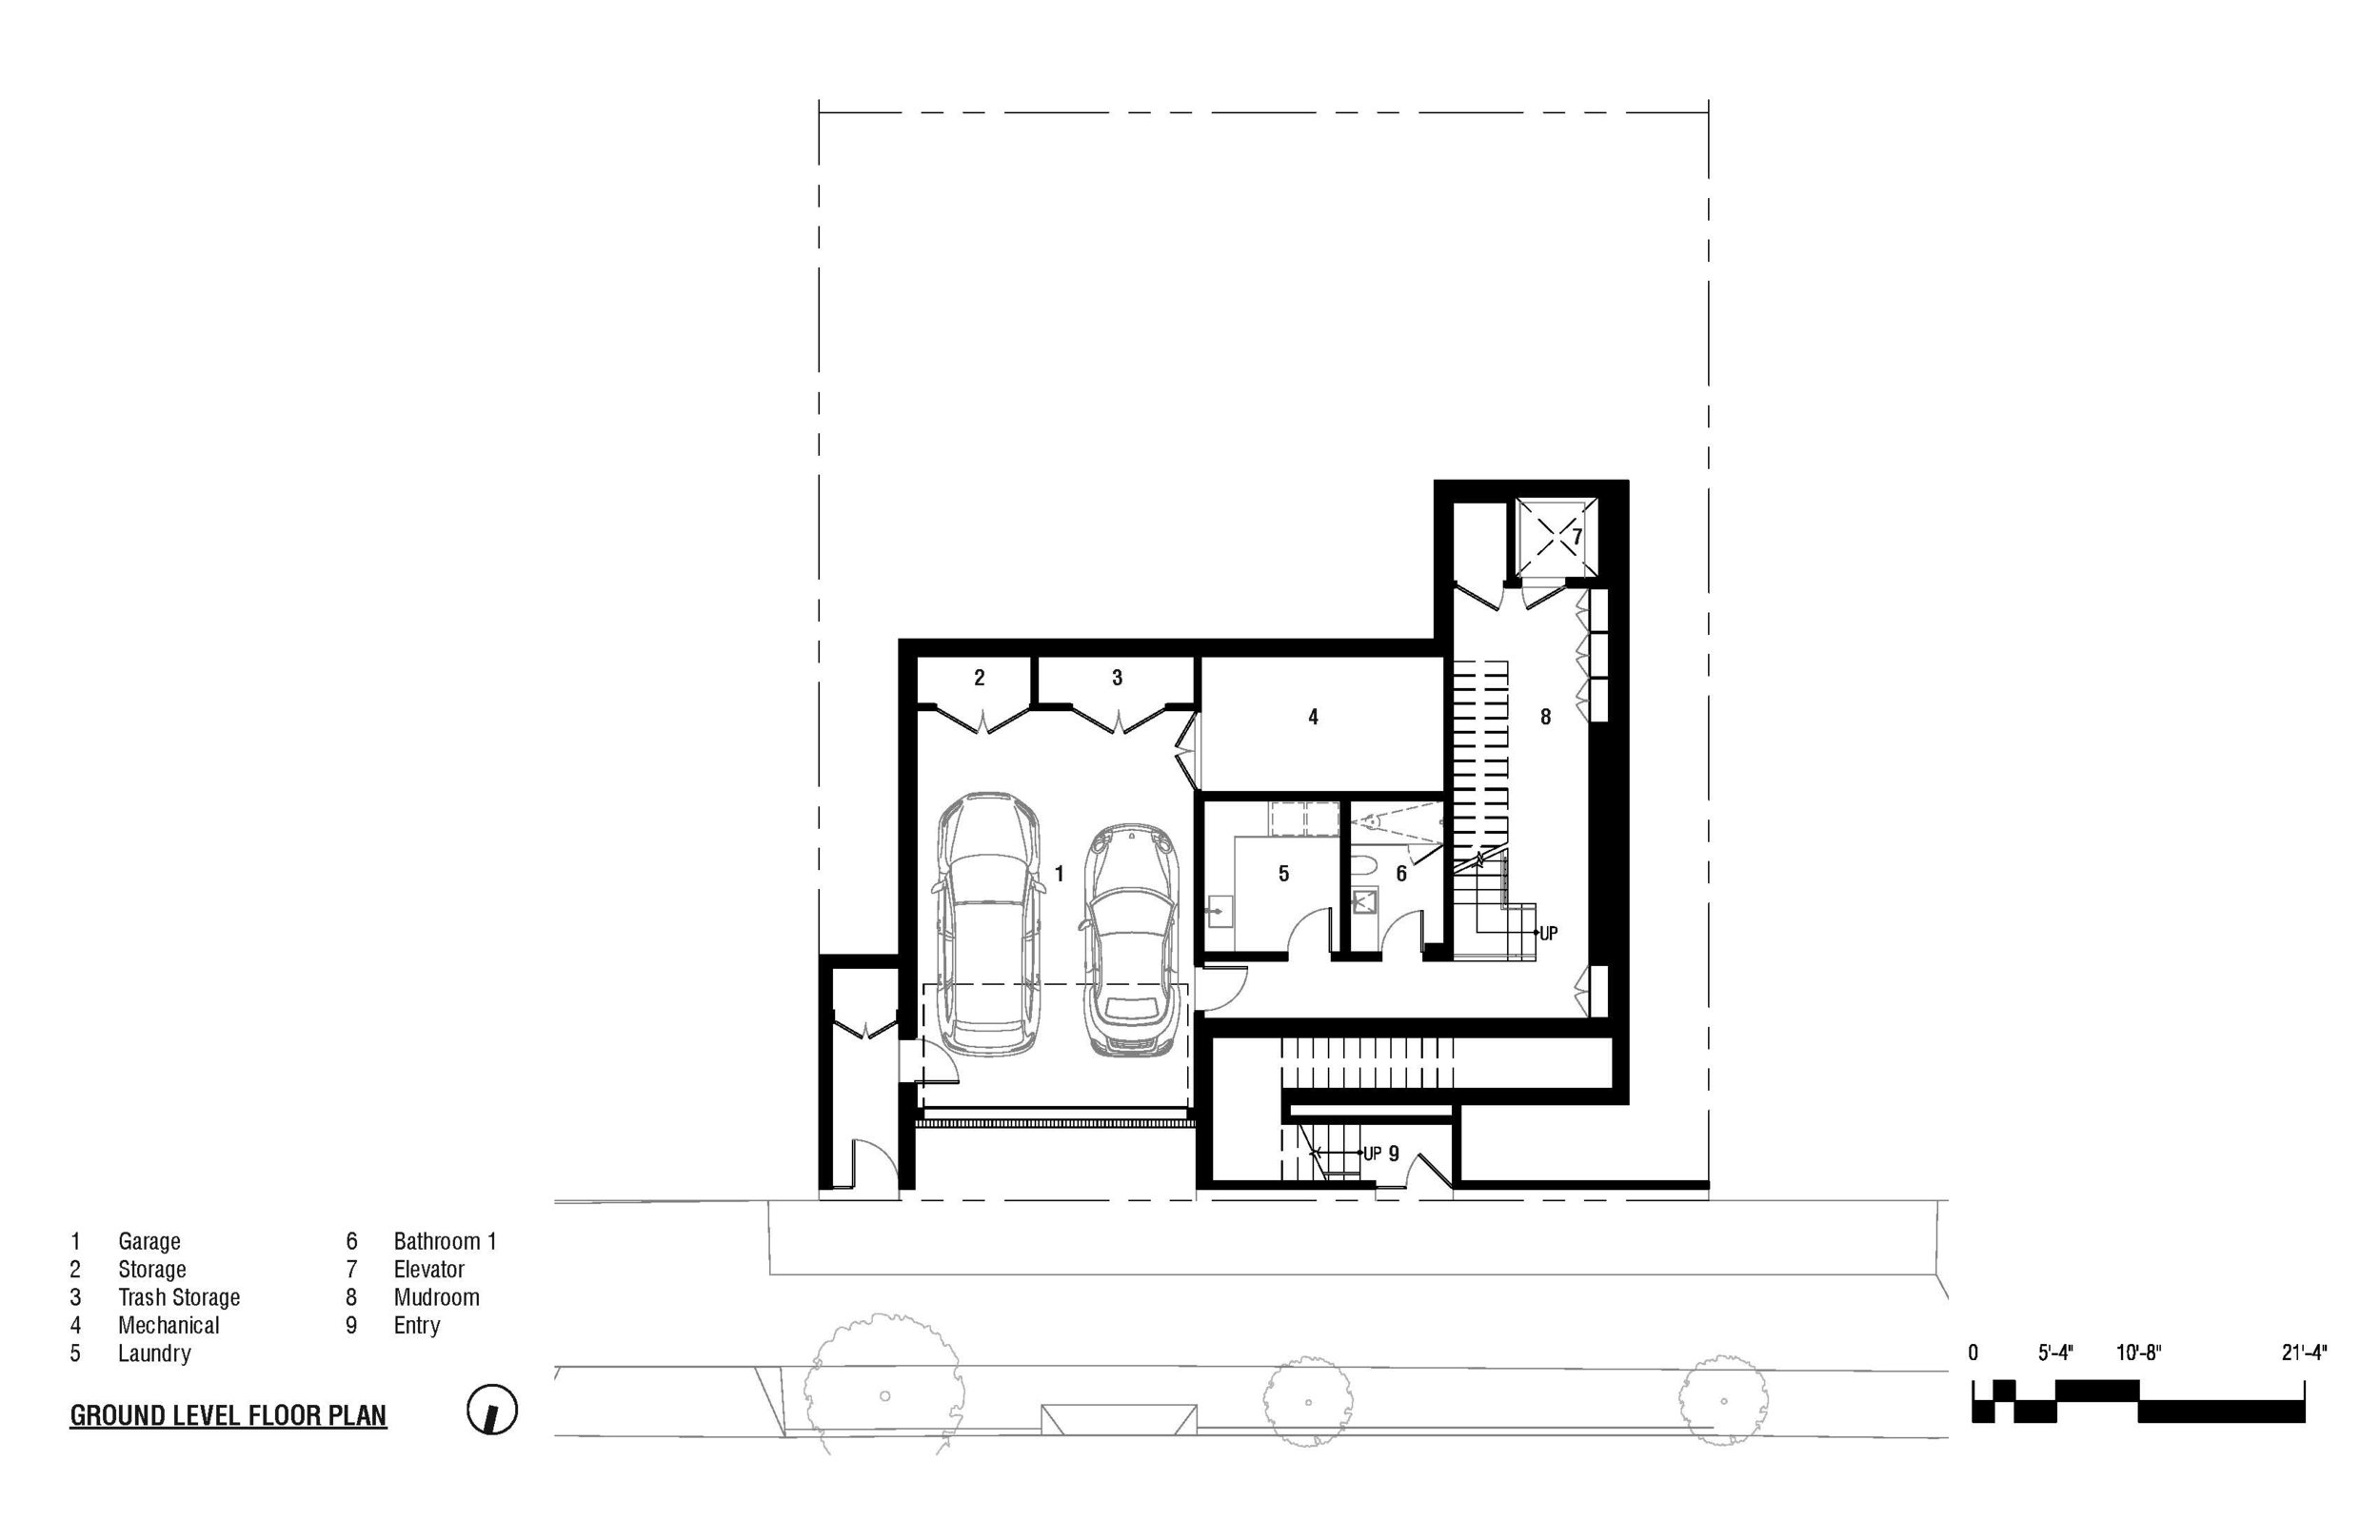 2018-0517 Vallejo- Floor Plan Layouts (1)_Page_1.jpg